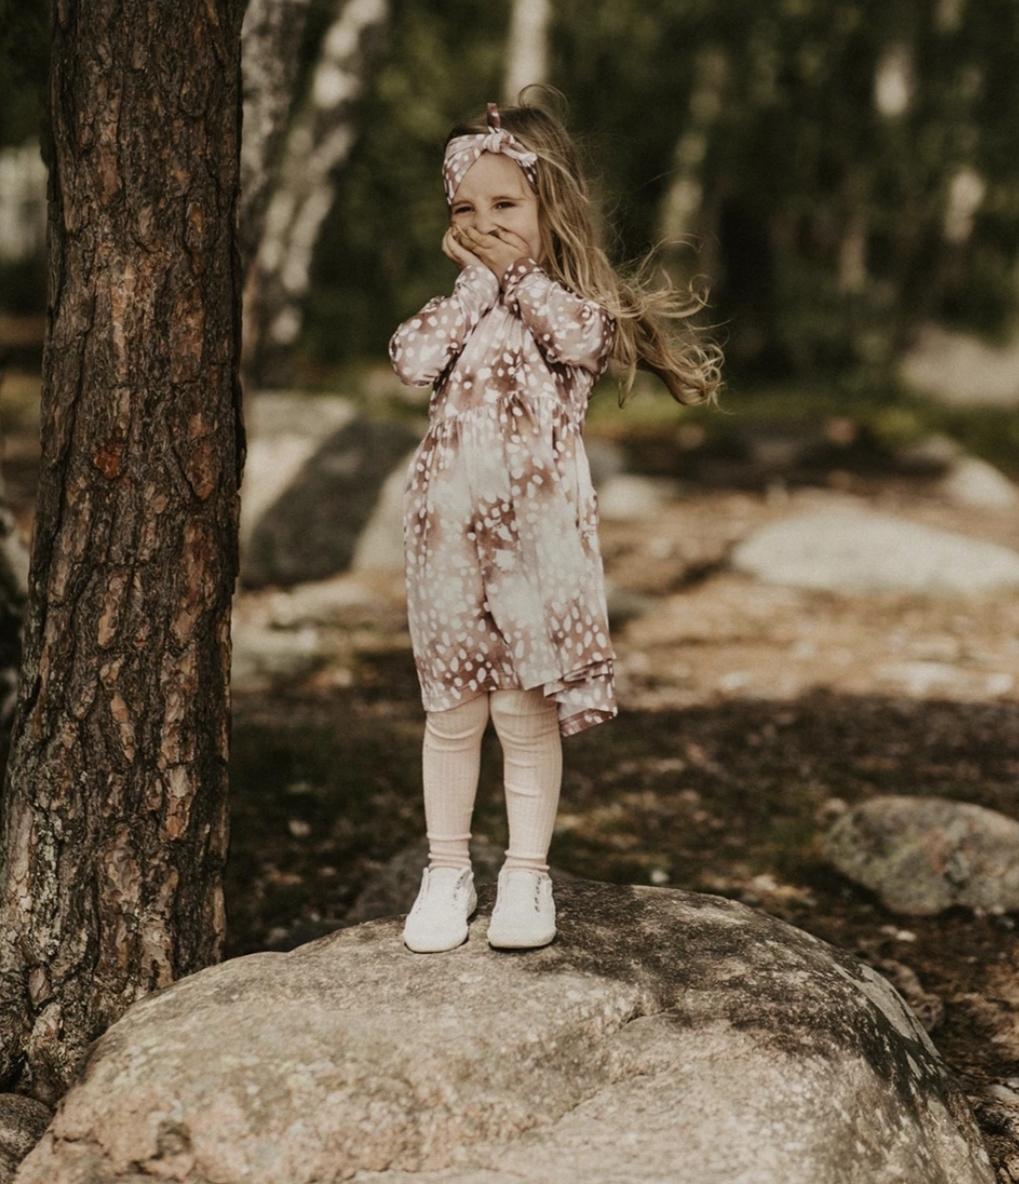 KAIKO Bambi Dress Ls, Copper Bambi | Lasten mekko, Copper